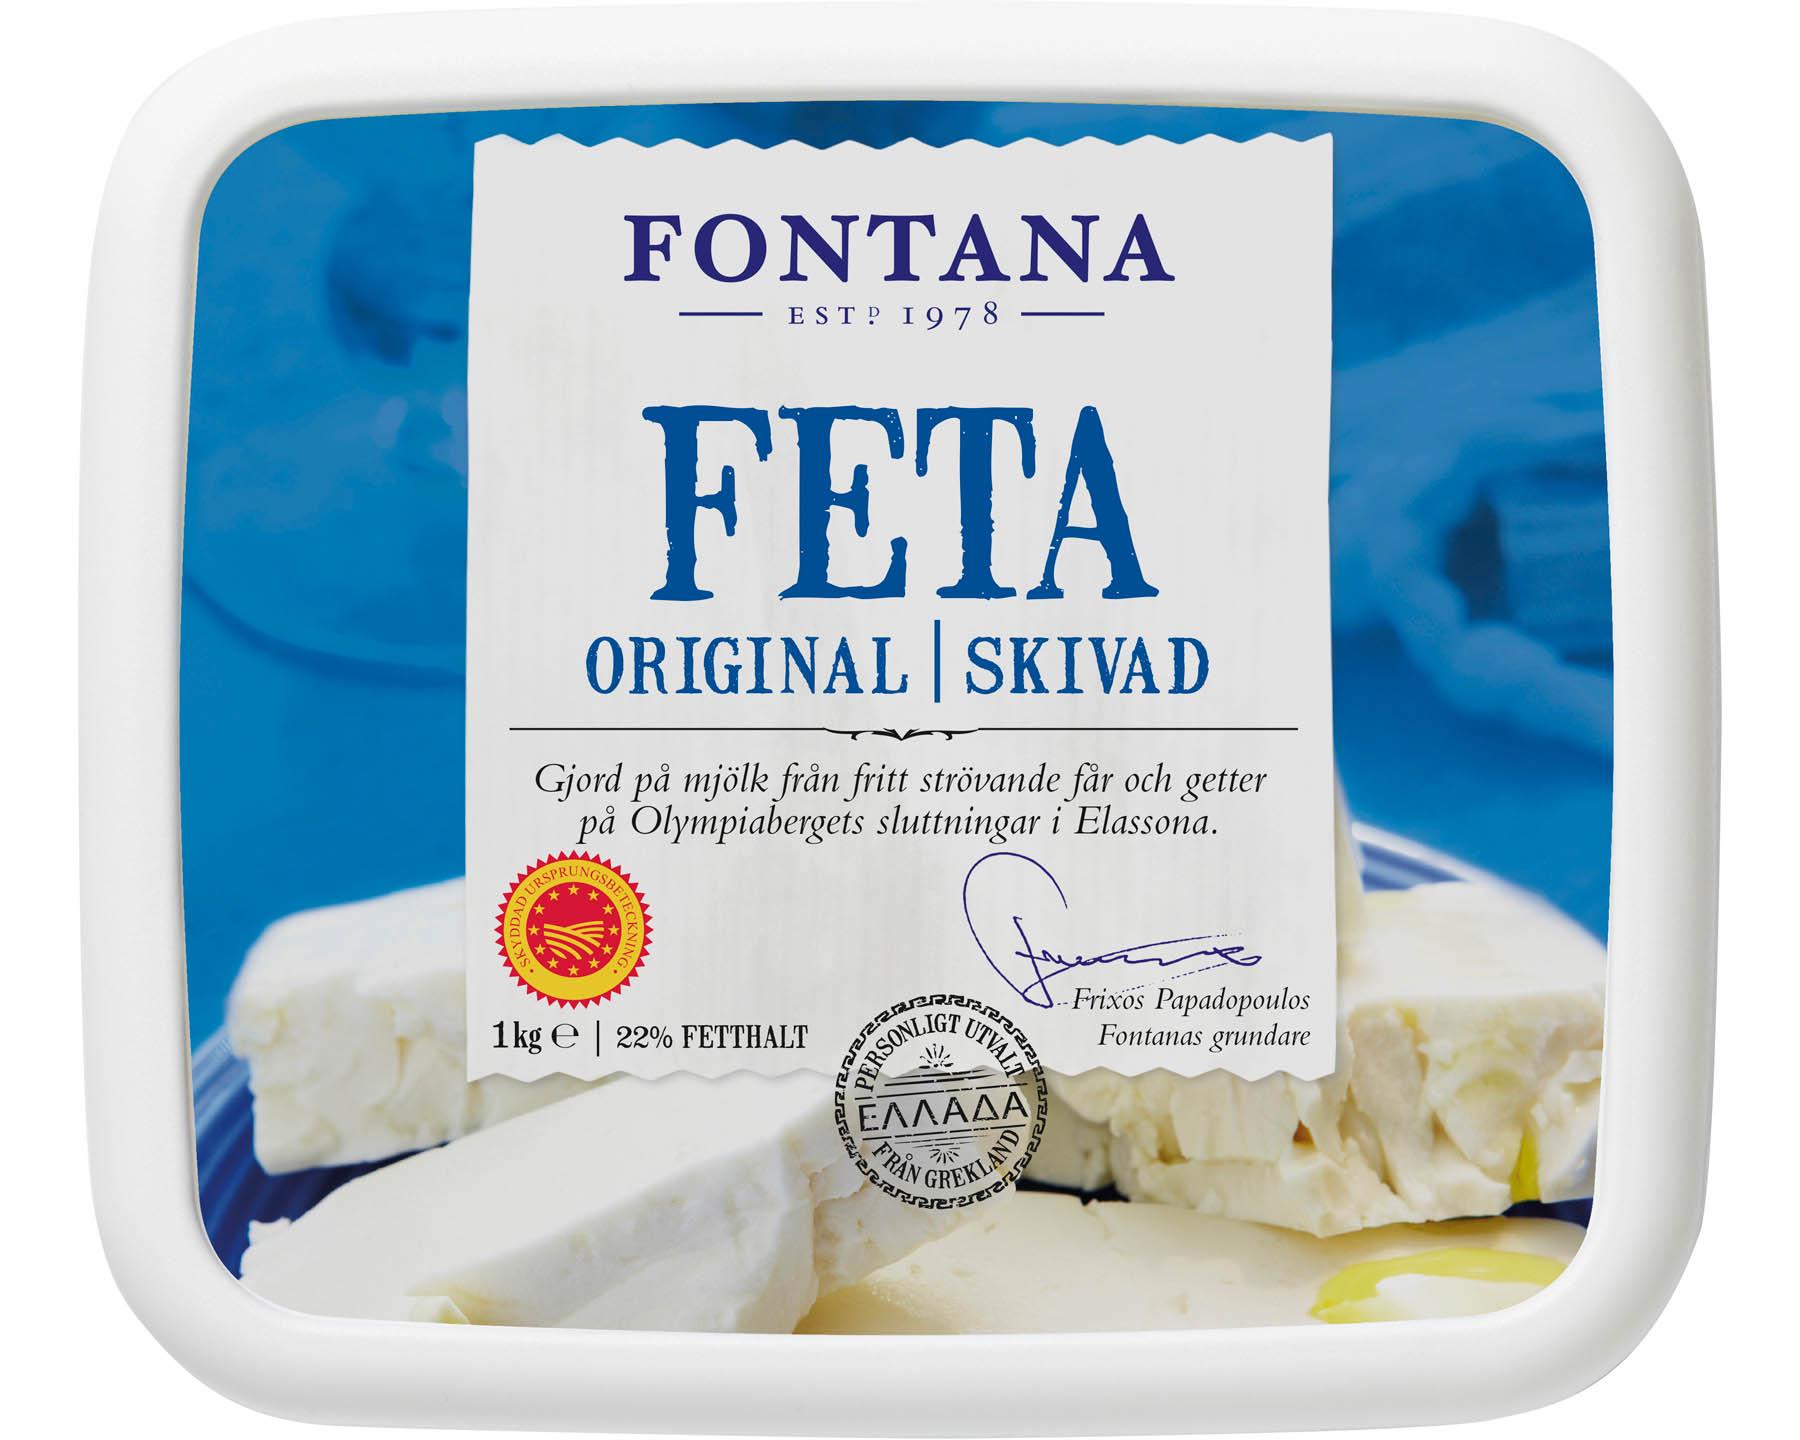 Fontana Feta Skivad